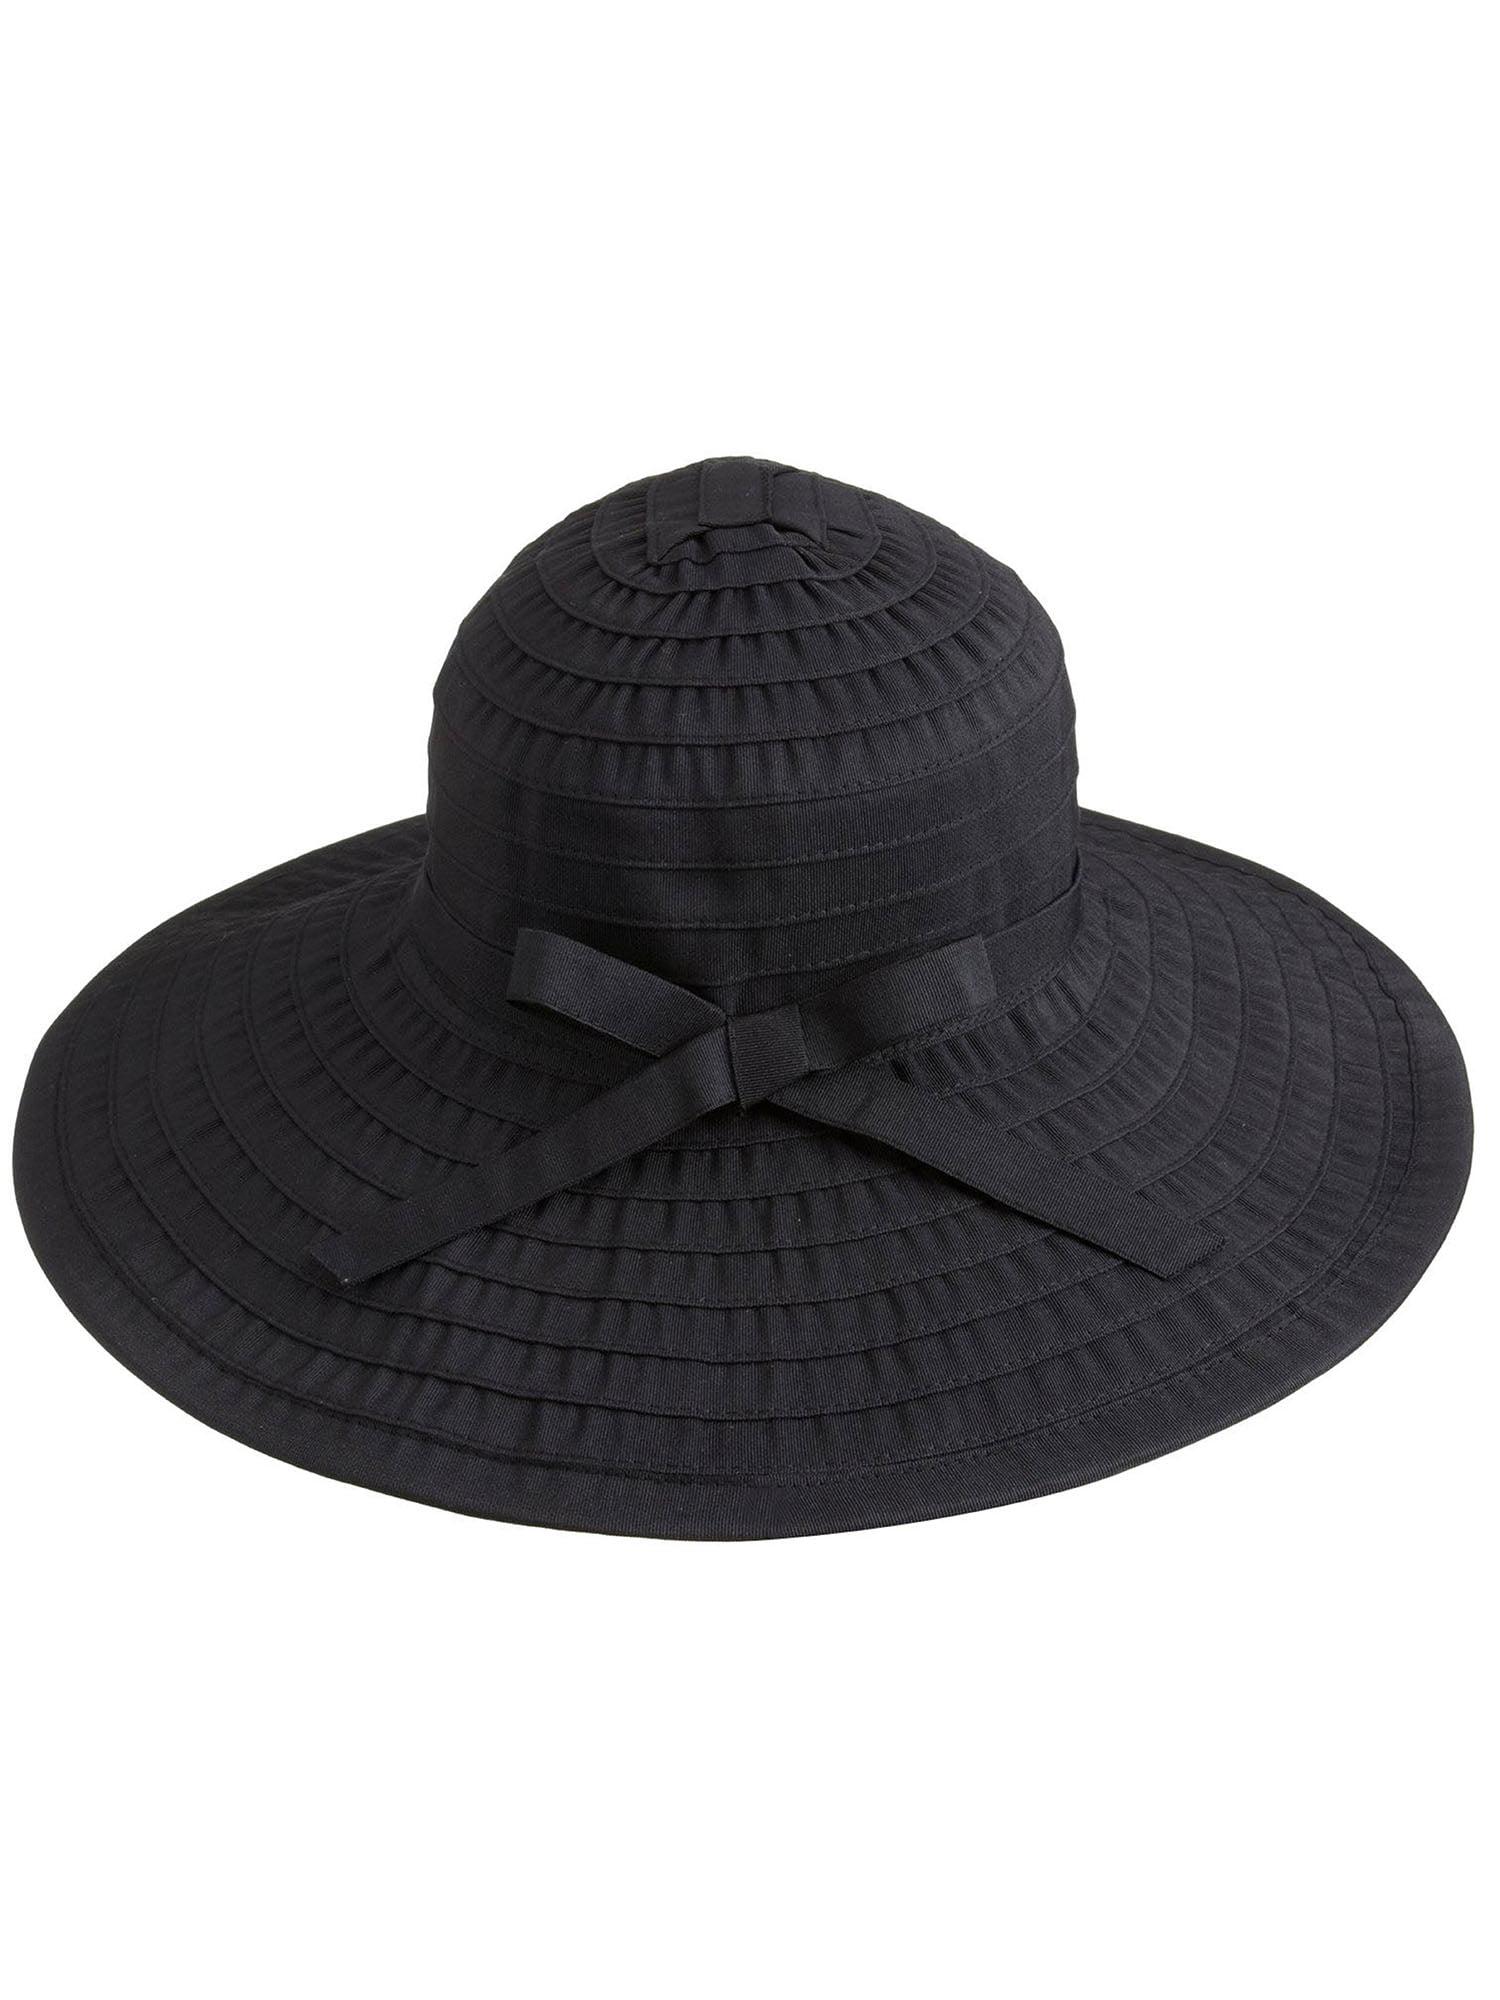 Simplicity - Women s Floppy Large Brim Beach Sun Hat with Ribbon ... 00ef7c6b4c40